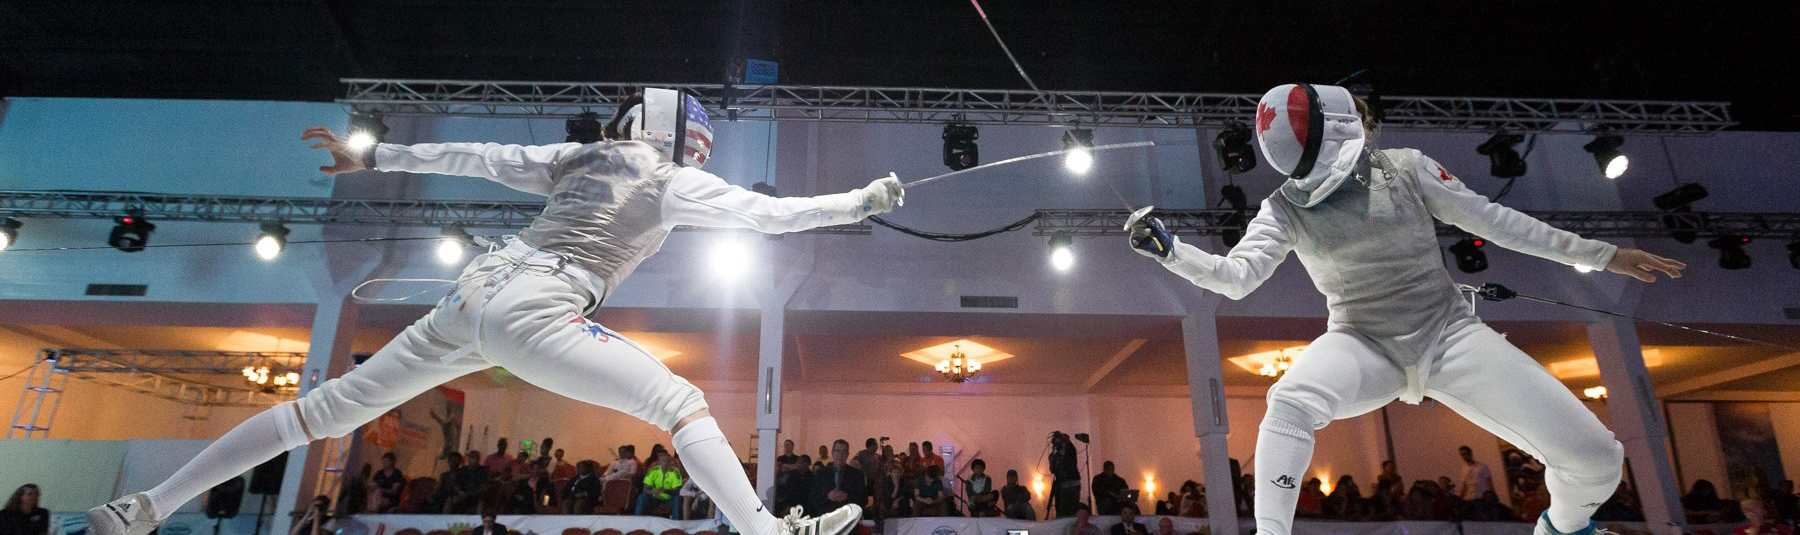 Olympic Team Canadian Fencing Federation Canadian